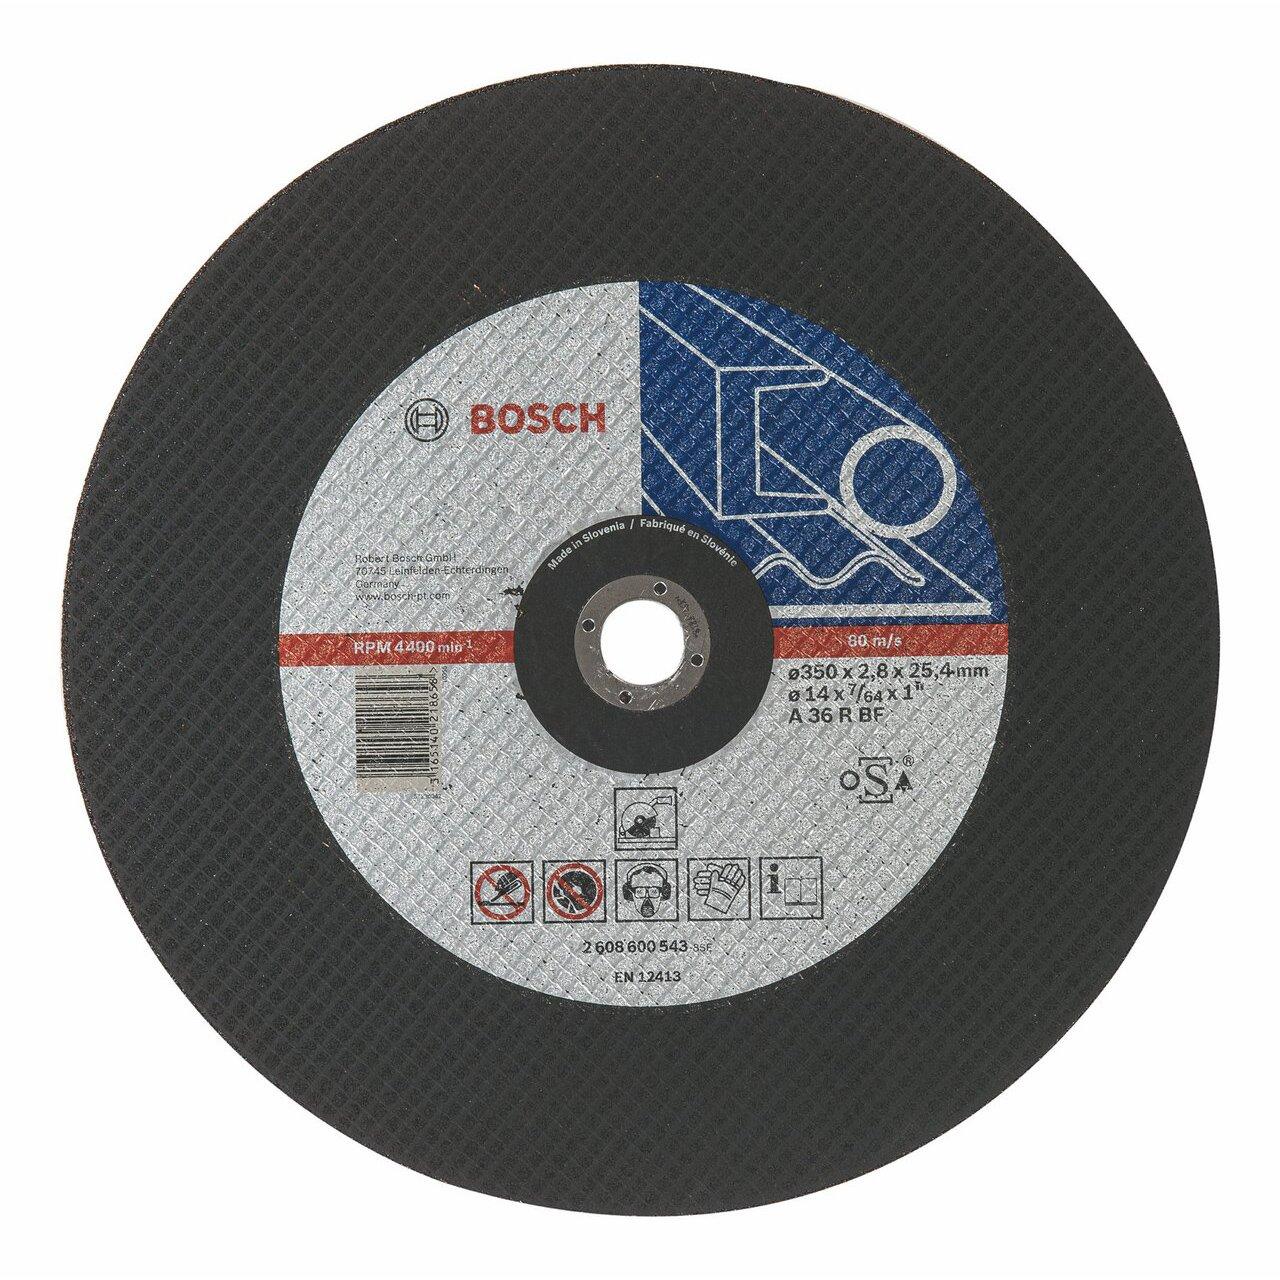 Bosch 2 608 600 543 - Disco de corte recto Expert for Metal - A 36 R BF, 350 mm, 25,40 mm, 2,8 mm (pack de 1) 2608600543